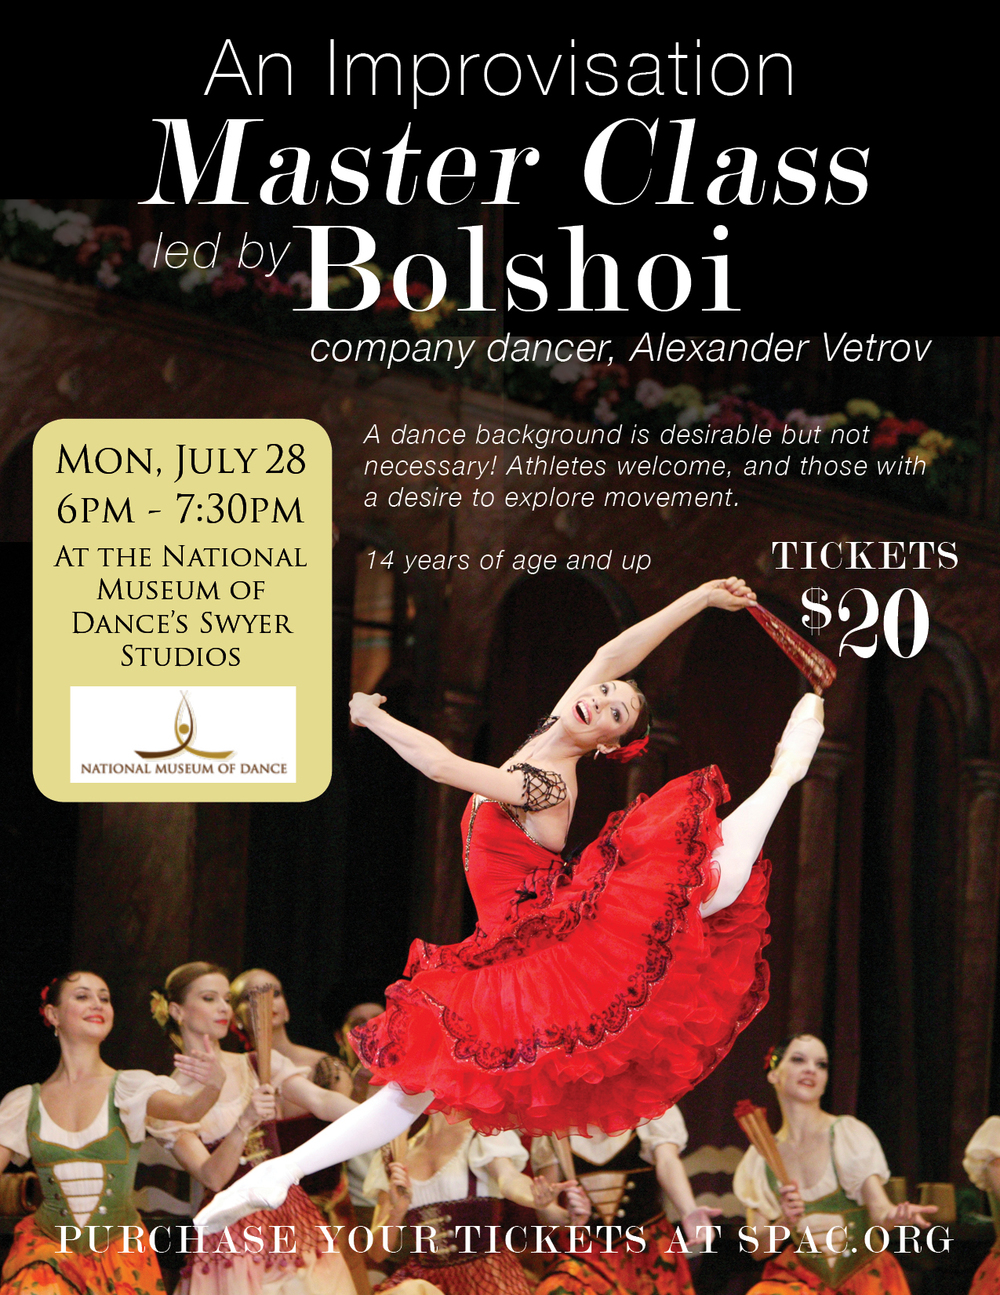 Bolshoi Improv masterclass.jpg